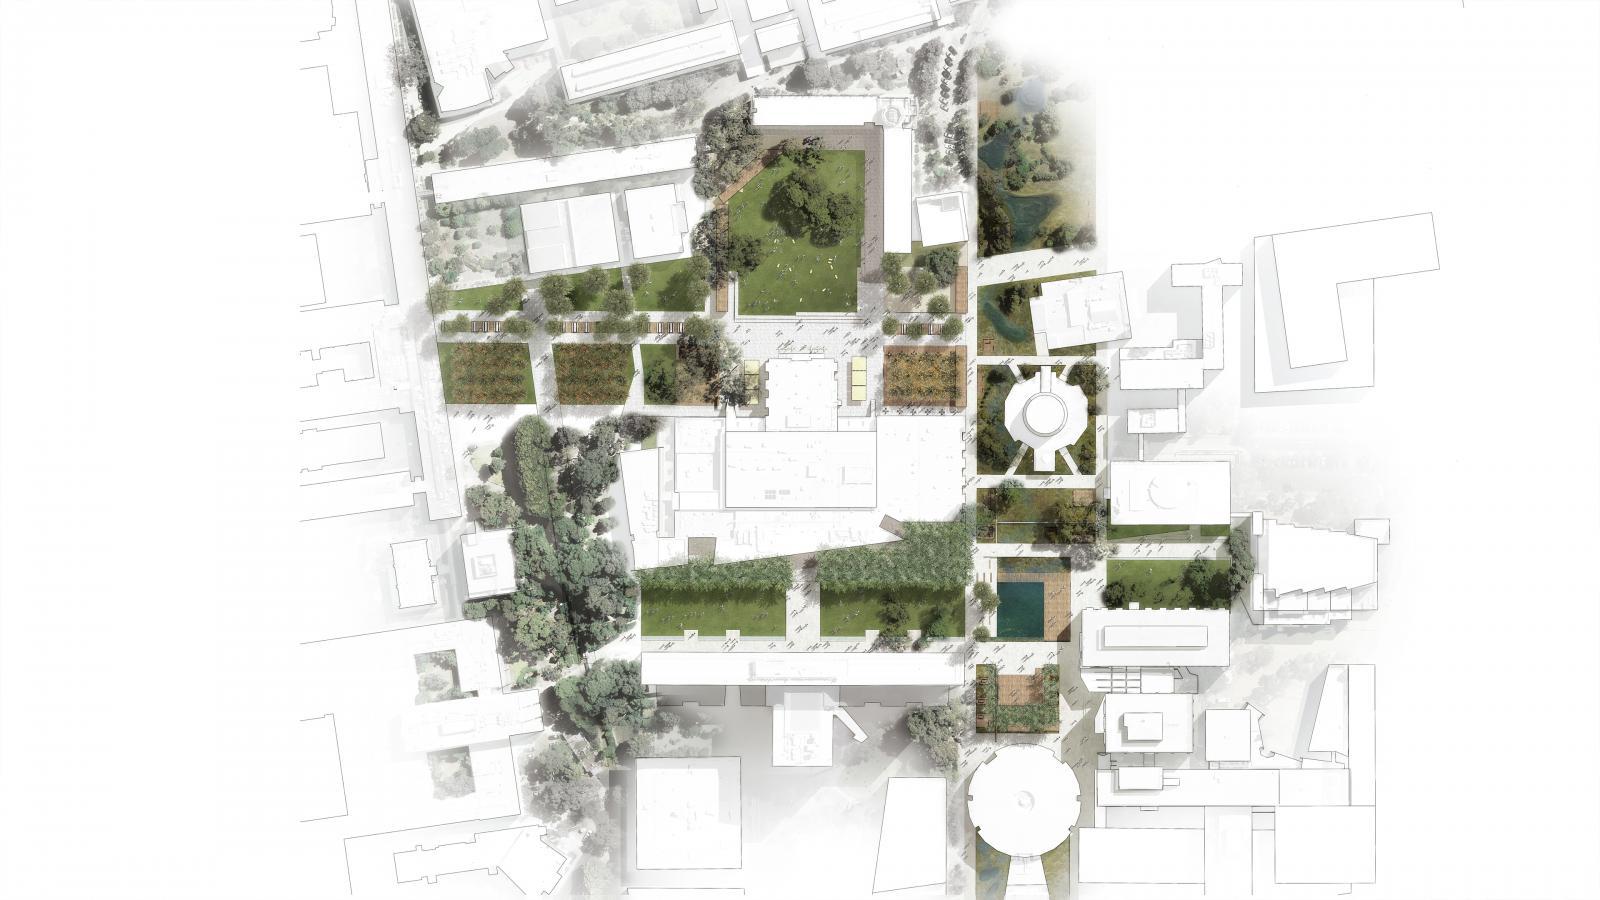 Monash Central Precinct Revitalisation Photo 1